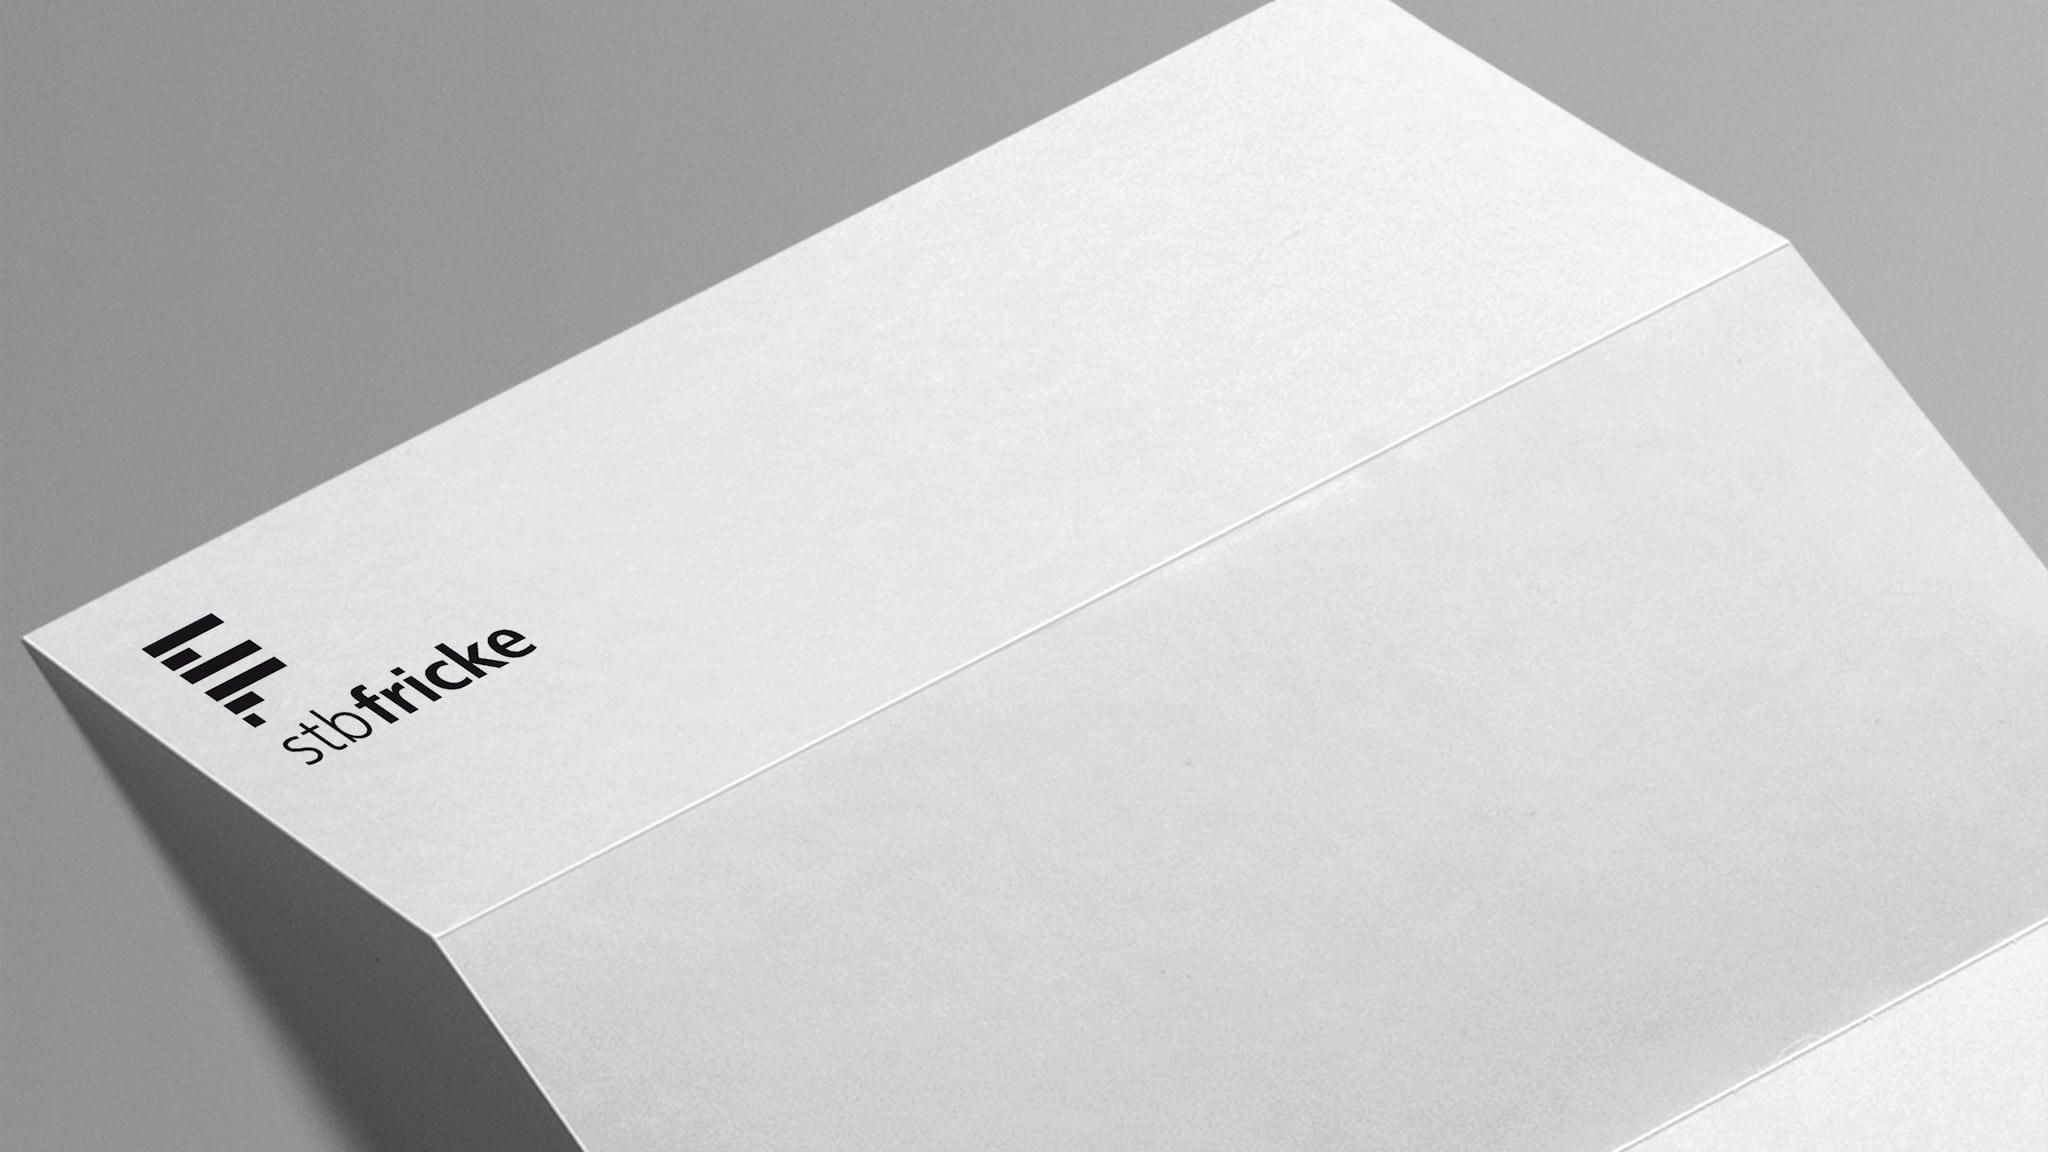 11_Stb-Fricke-Corporate-Design-3